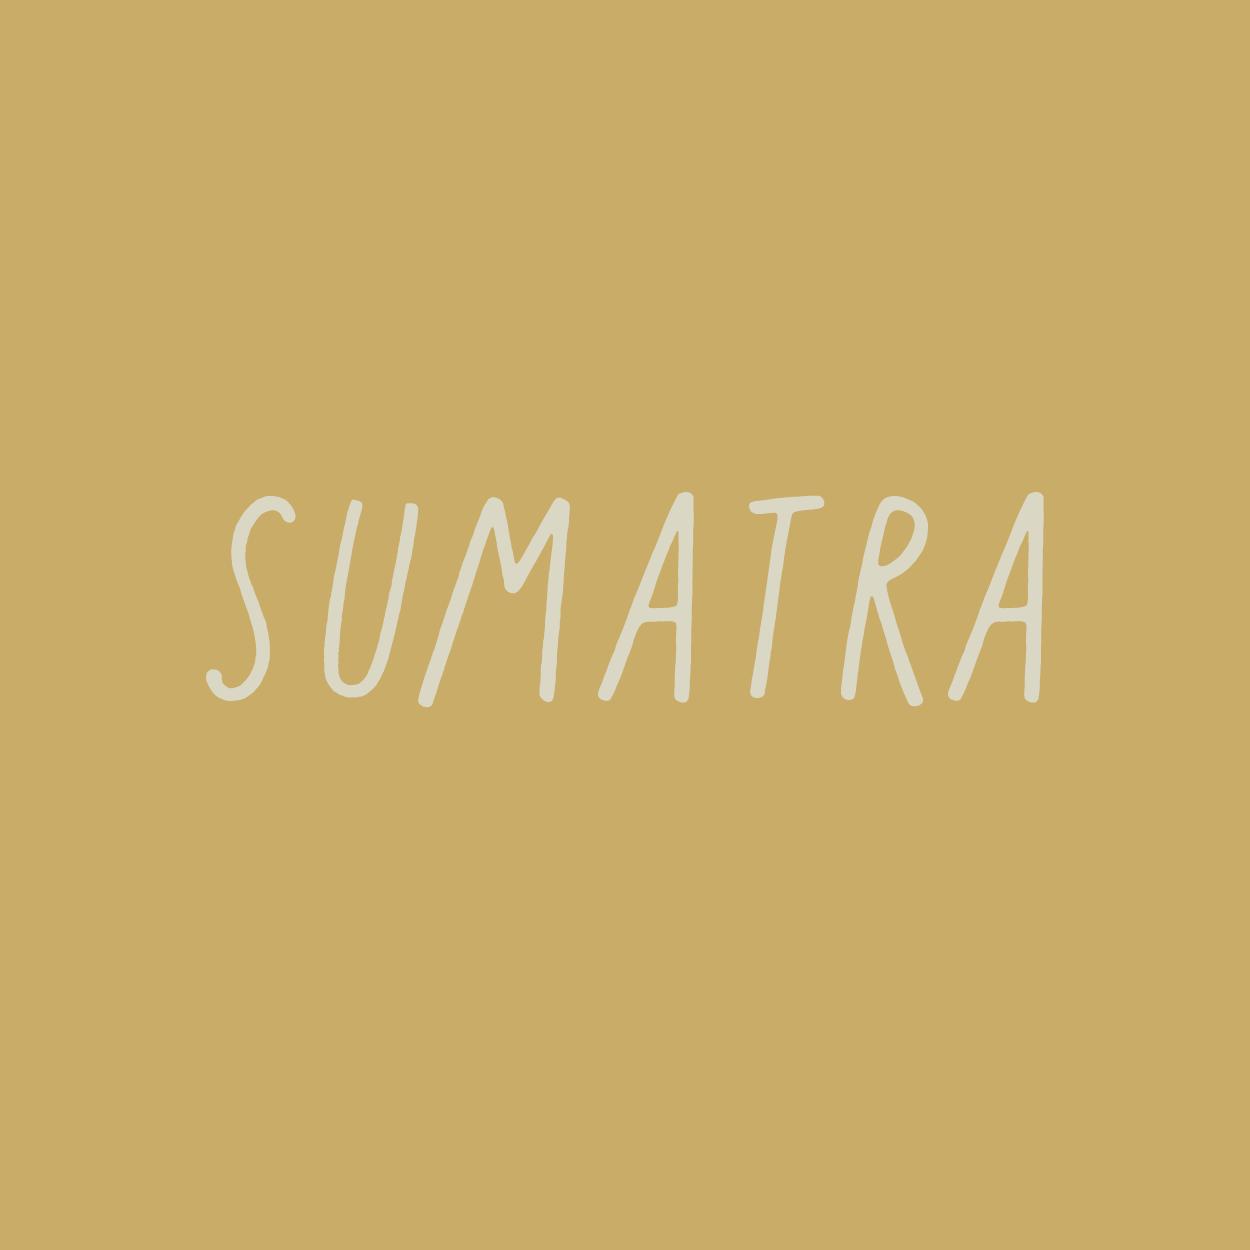 sumatra_office.png